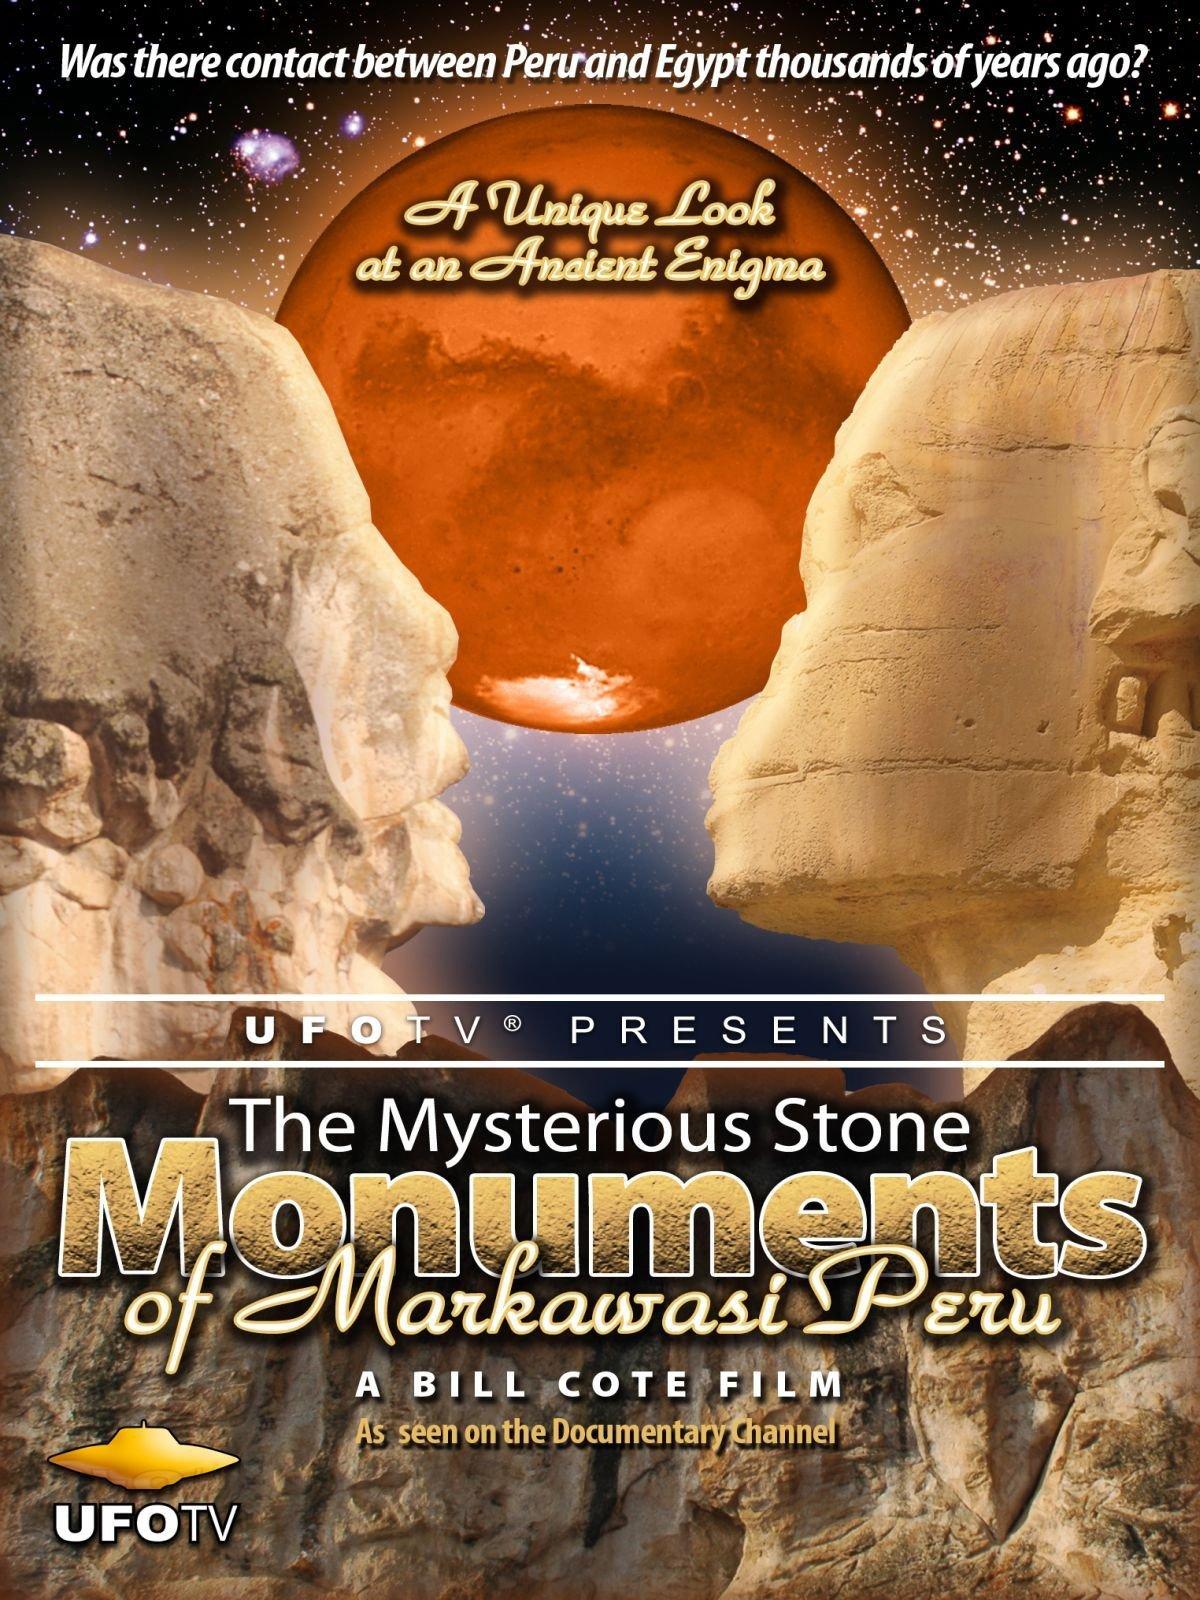 UFOTV Presents: The Mysterious Stone Monuments of Markawasi Peru on Amazon Prime Video UK